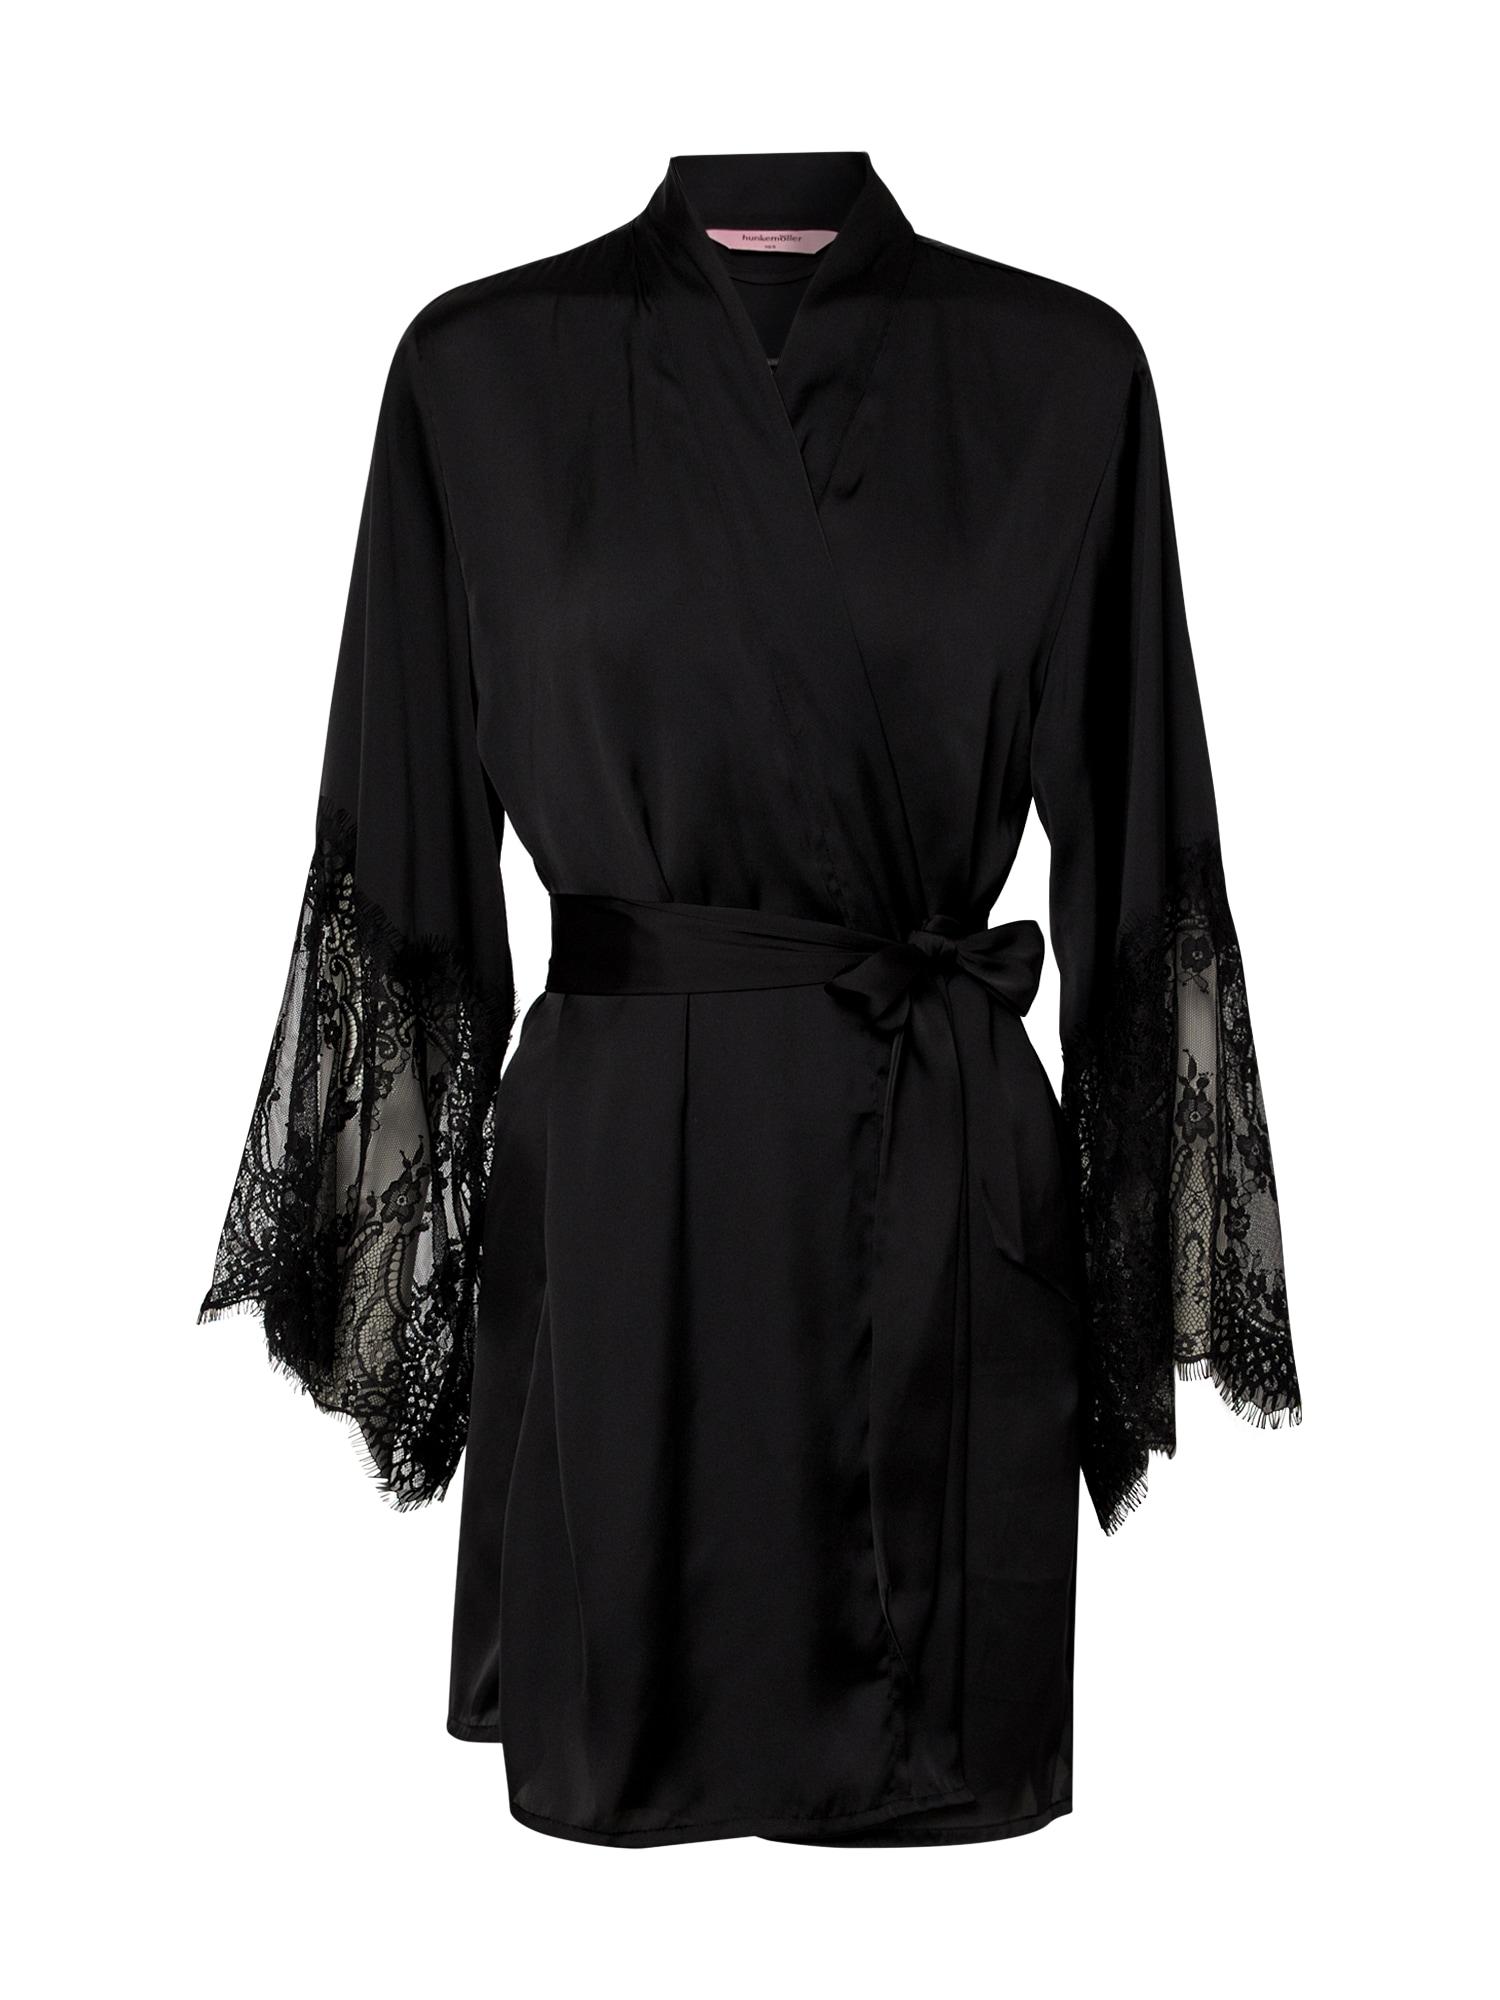 Hunkemöller Peniuaras 'Kimono Lace' juoda